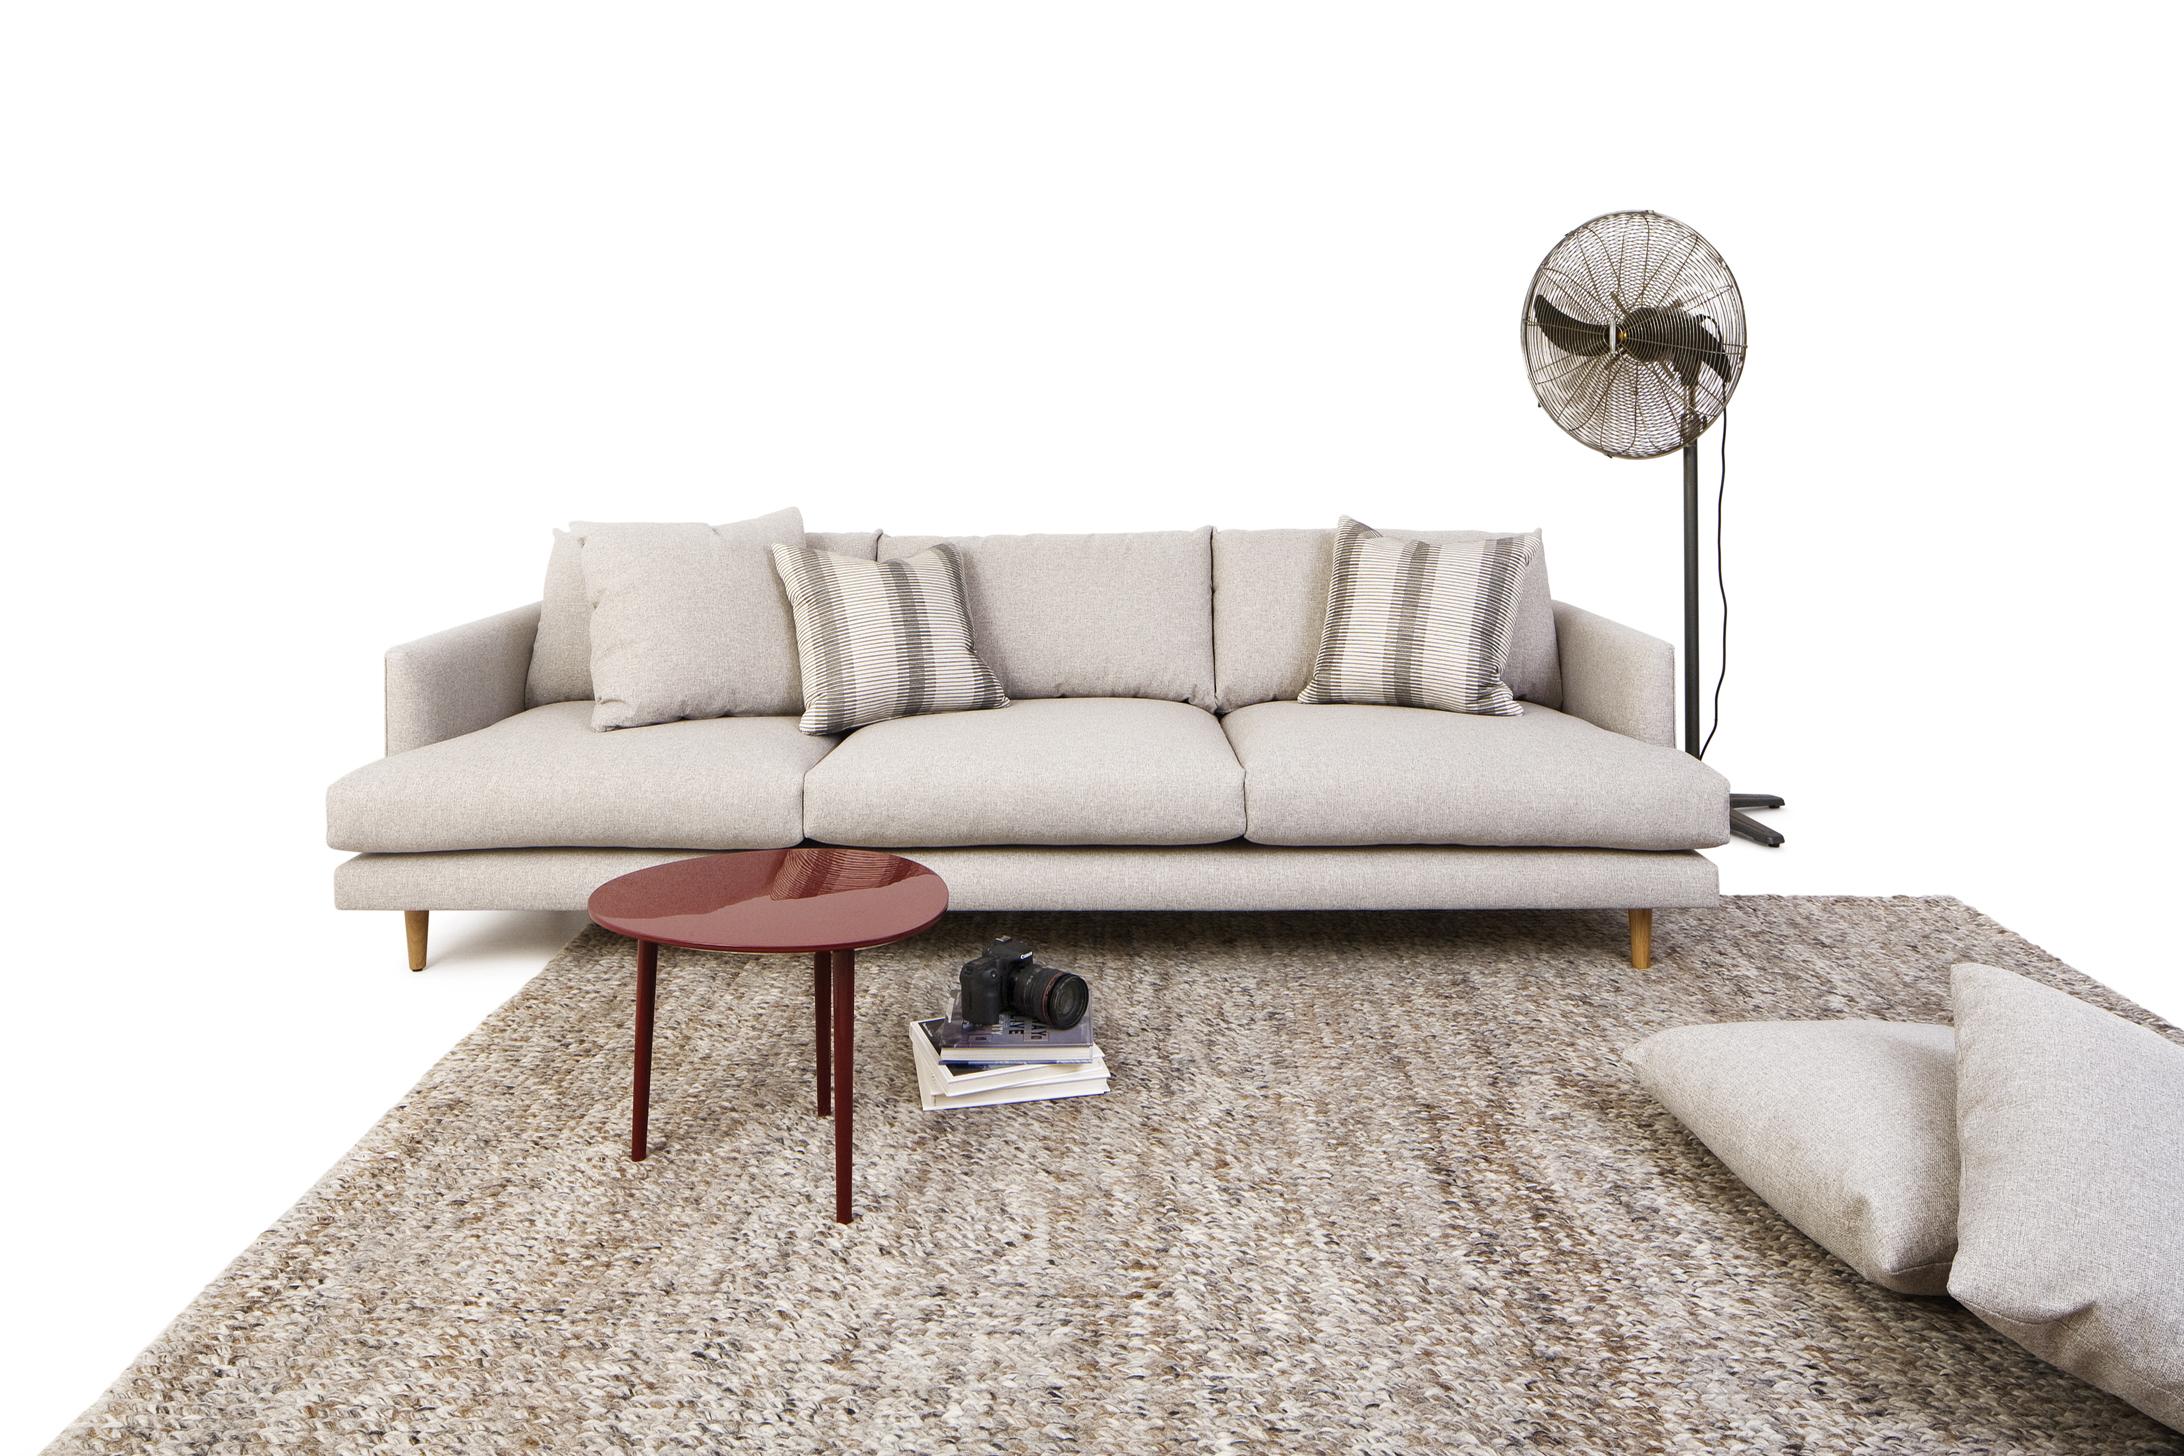 deep sofas leather sofa austin texas frankie fanuli furniture